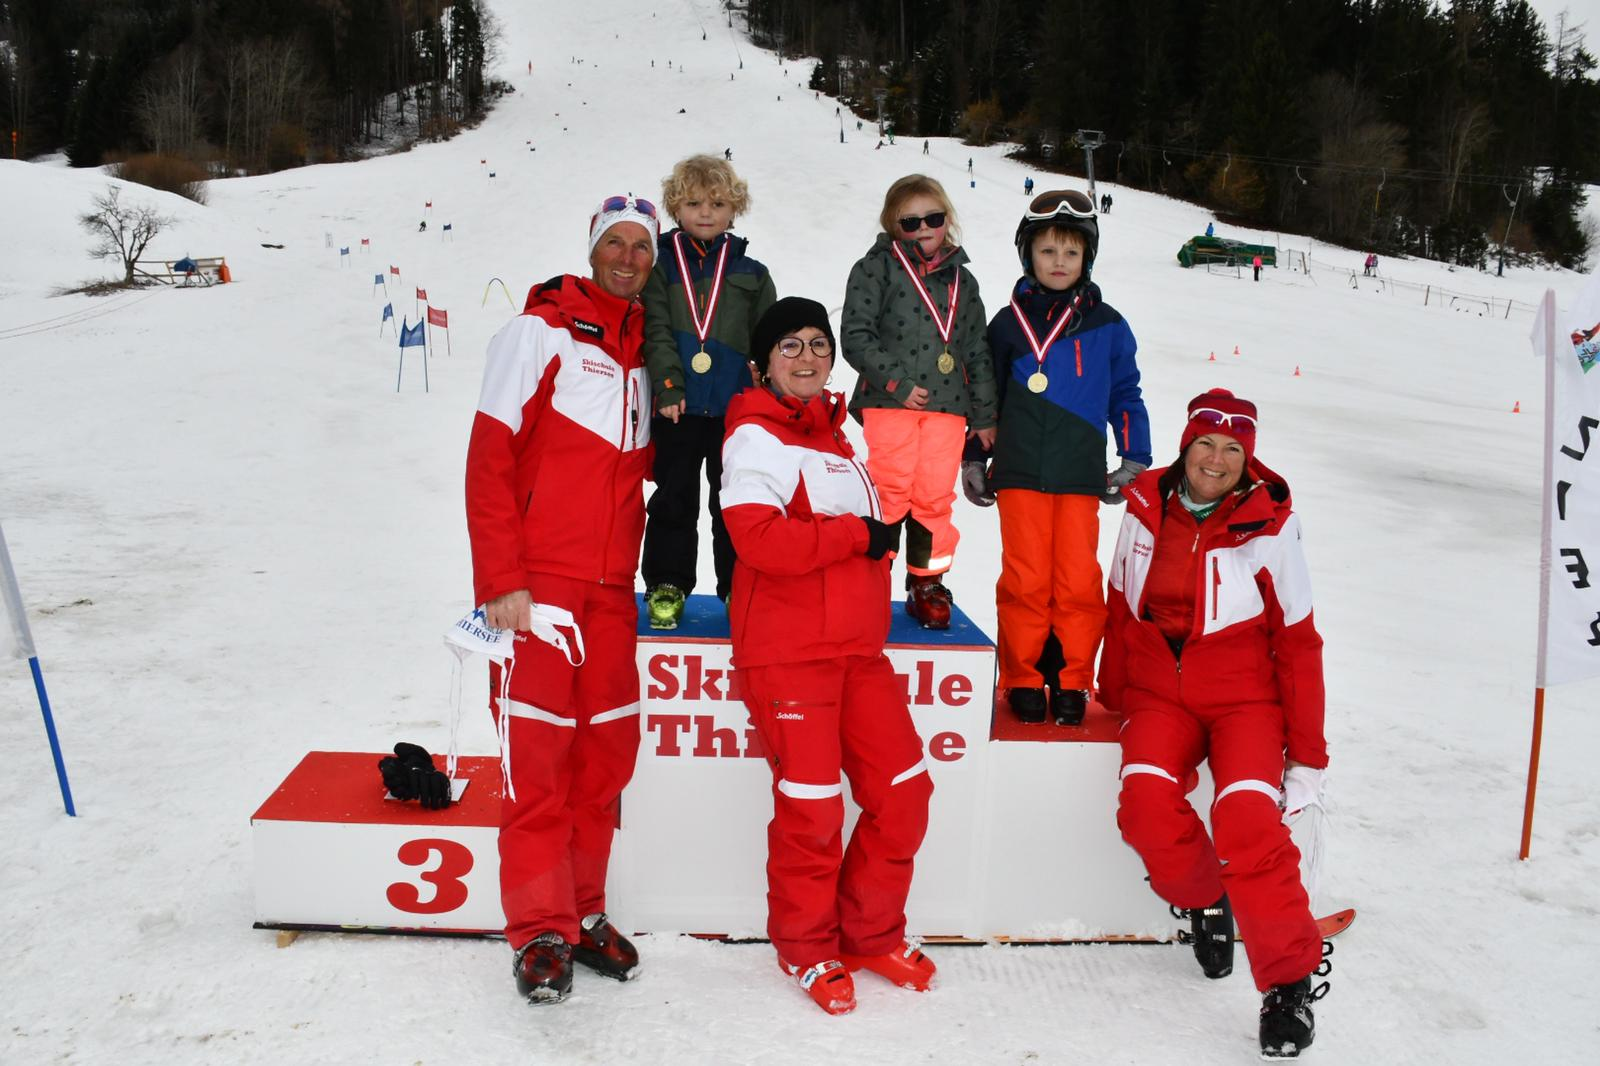 Skiverleih Thiersee – Sporthaler